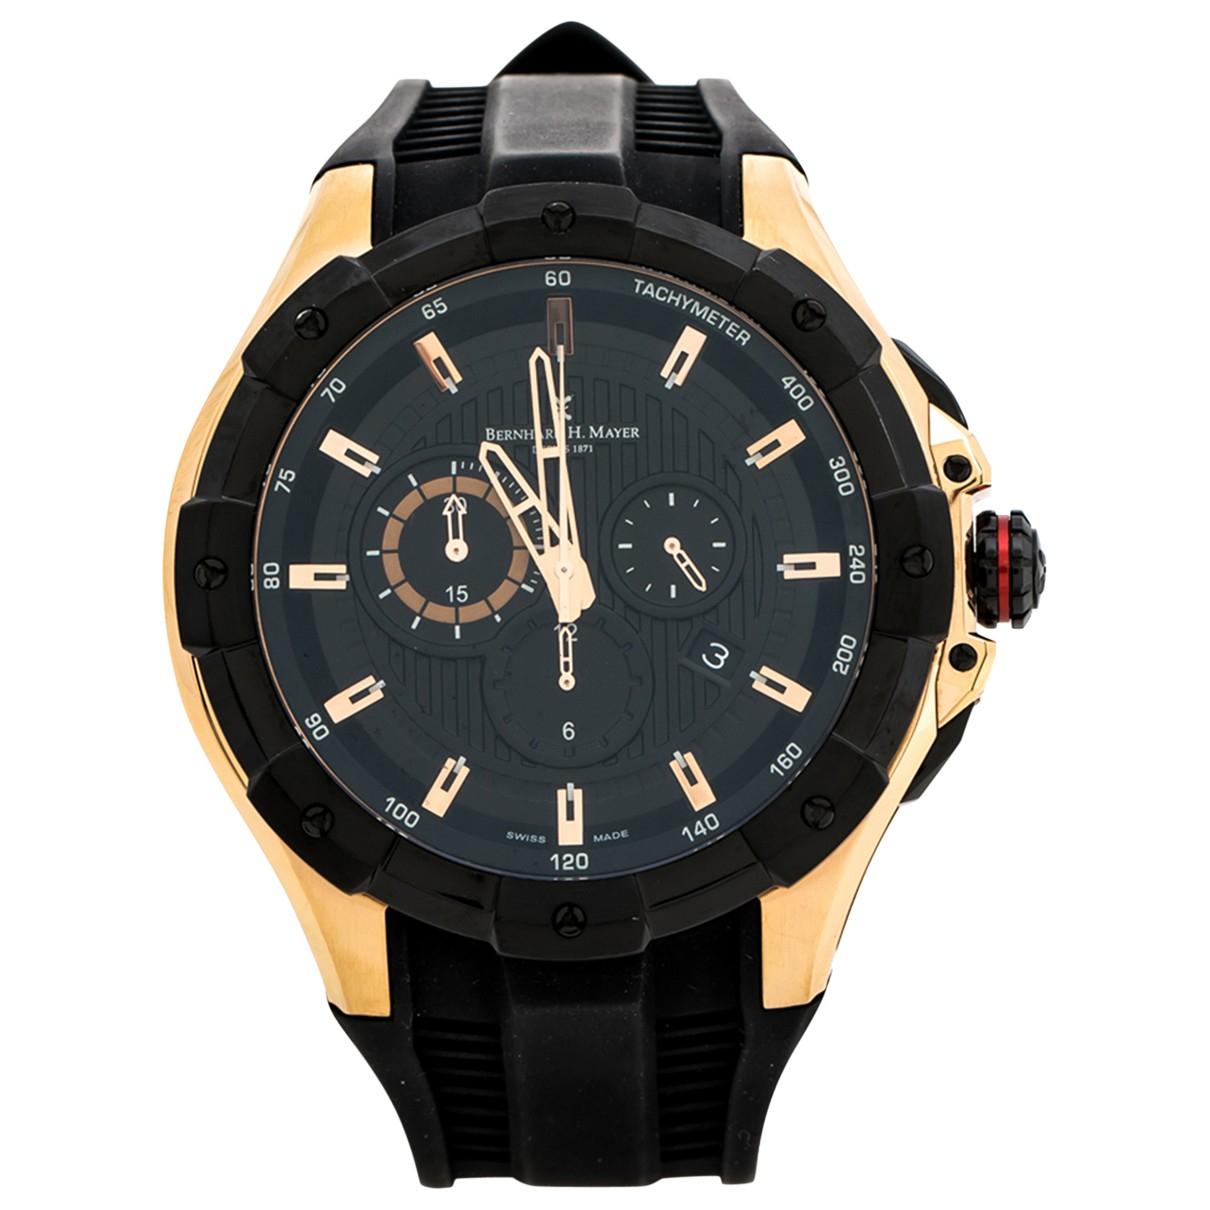 Bernhard H Mayer \N Black watch for Men \N